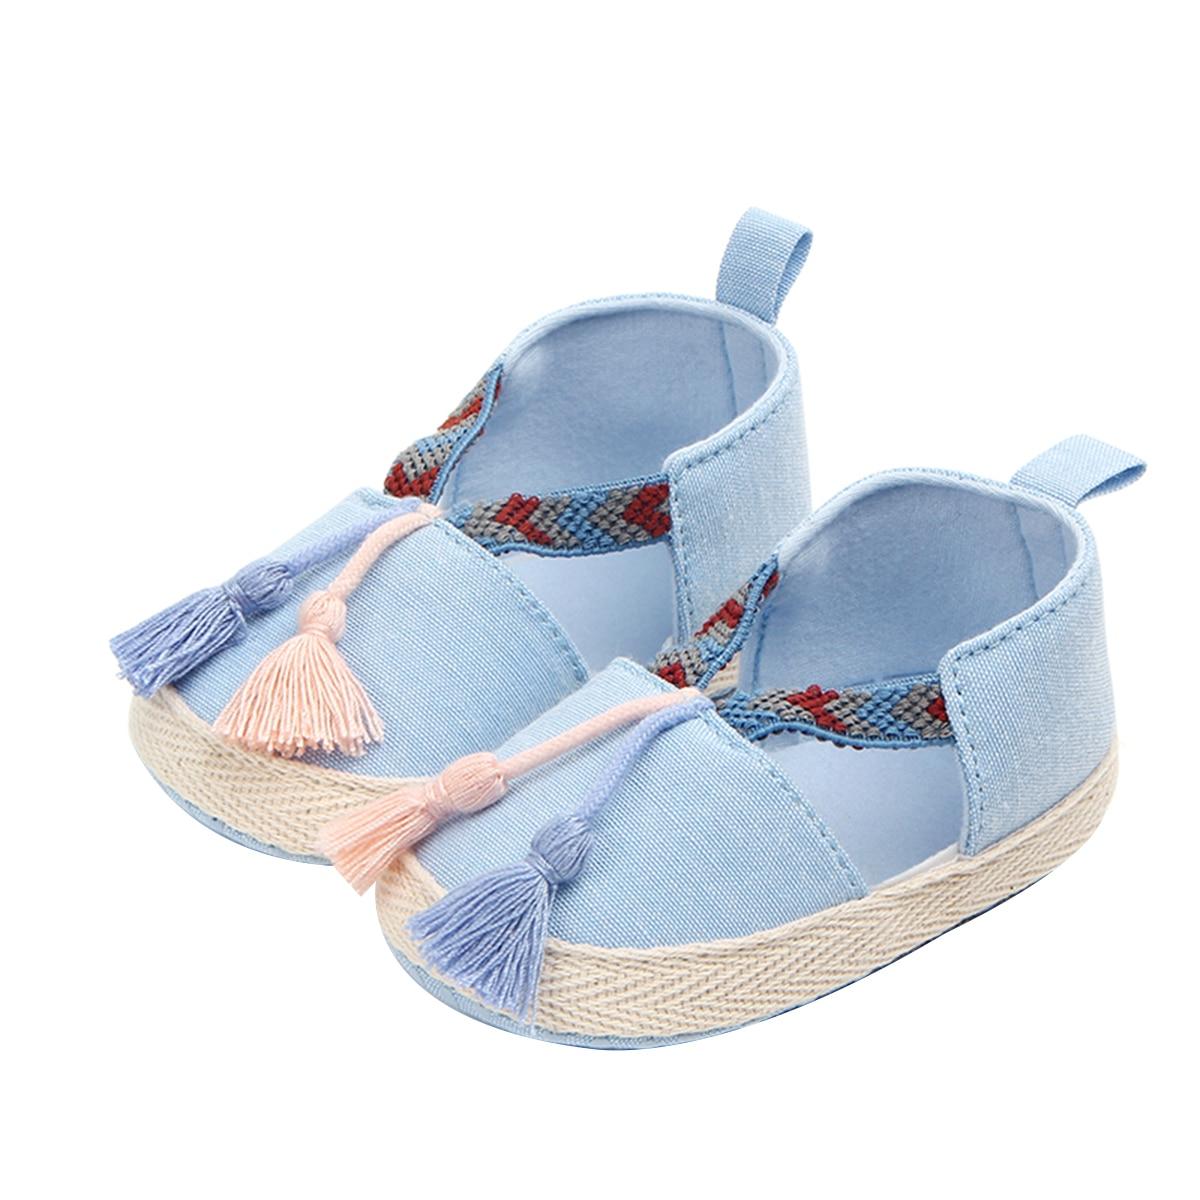 Flats Dress-Shoes Newborn Infant Baby-Girls Princess Prewalker Tassels Anti-Slip Soft-Sole